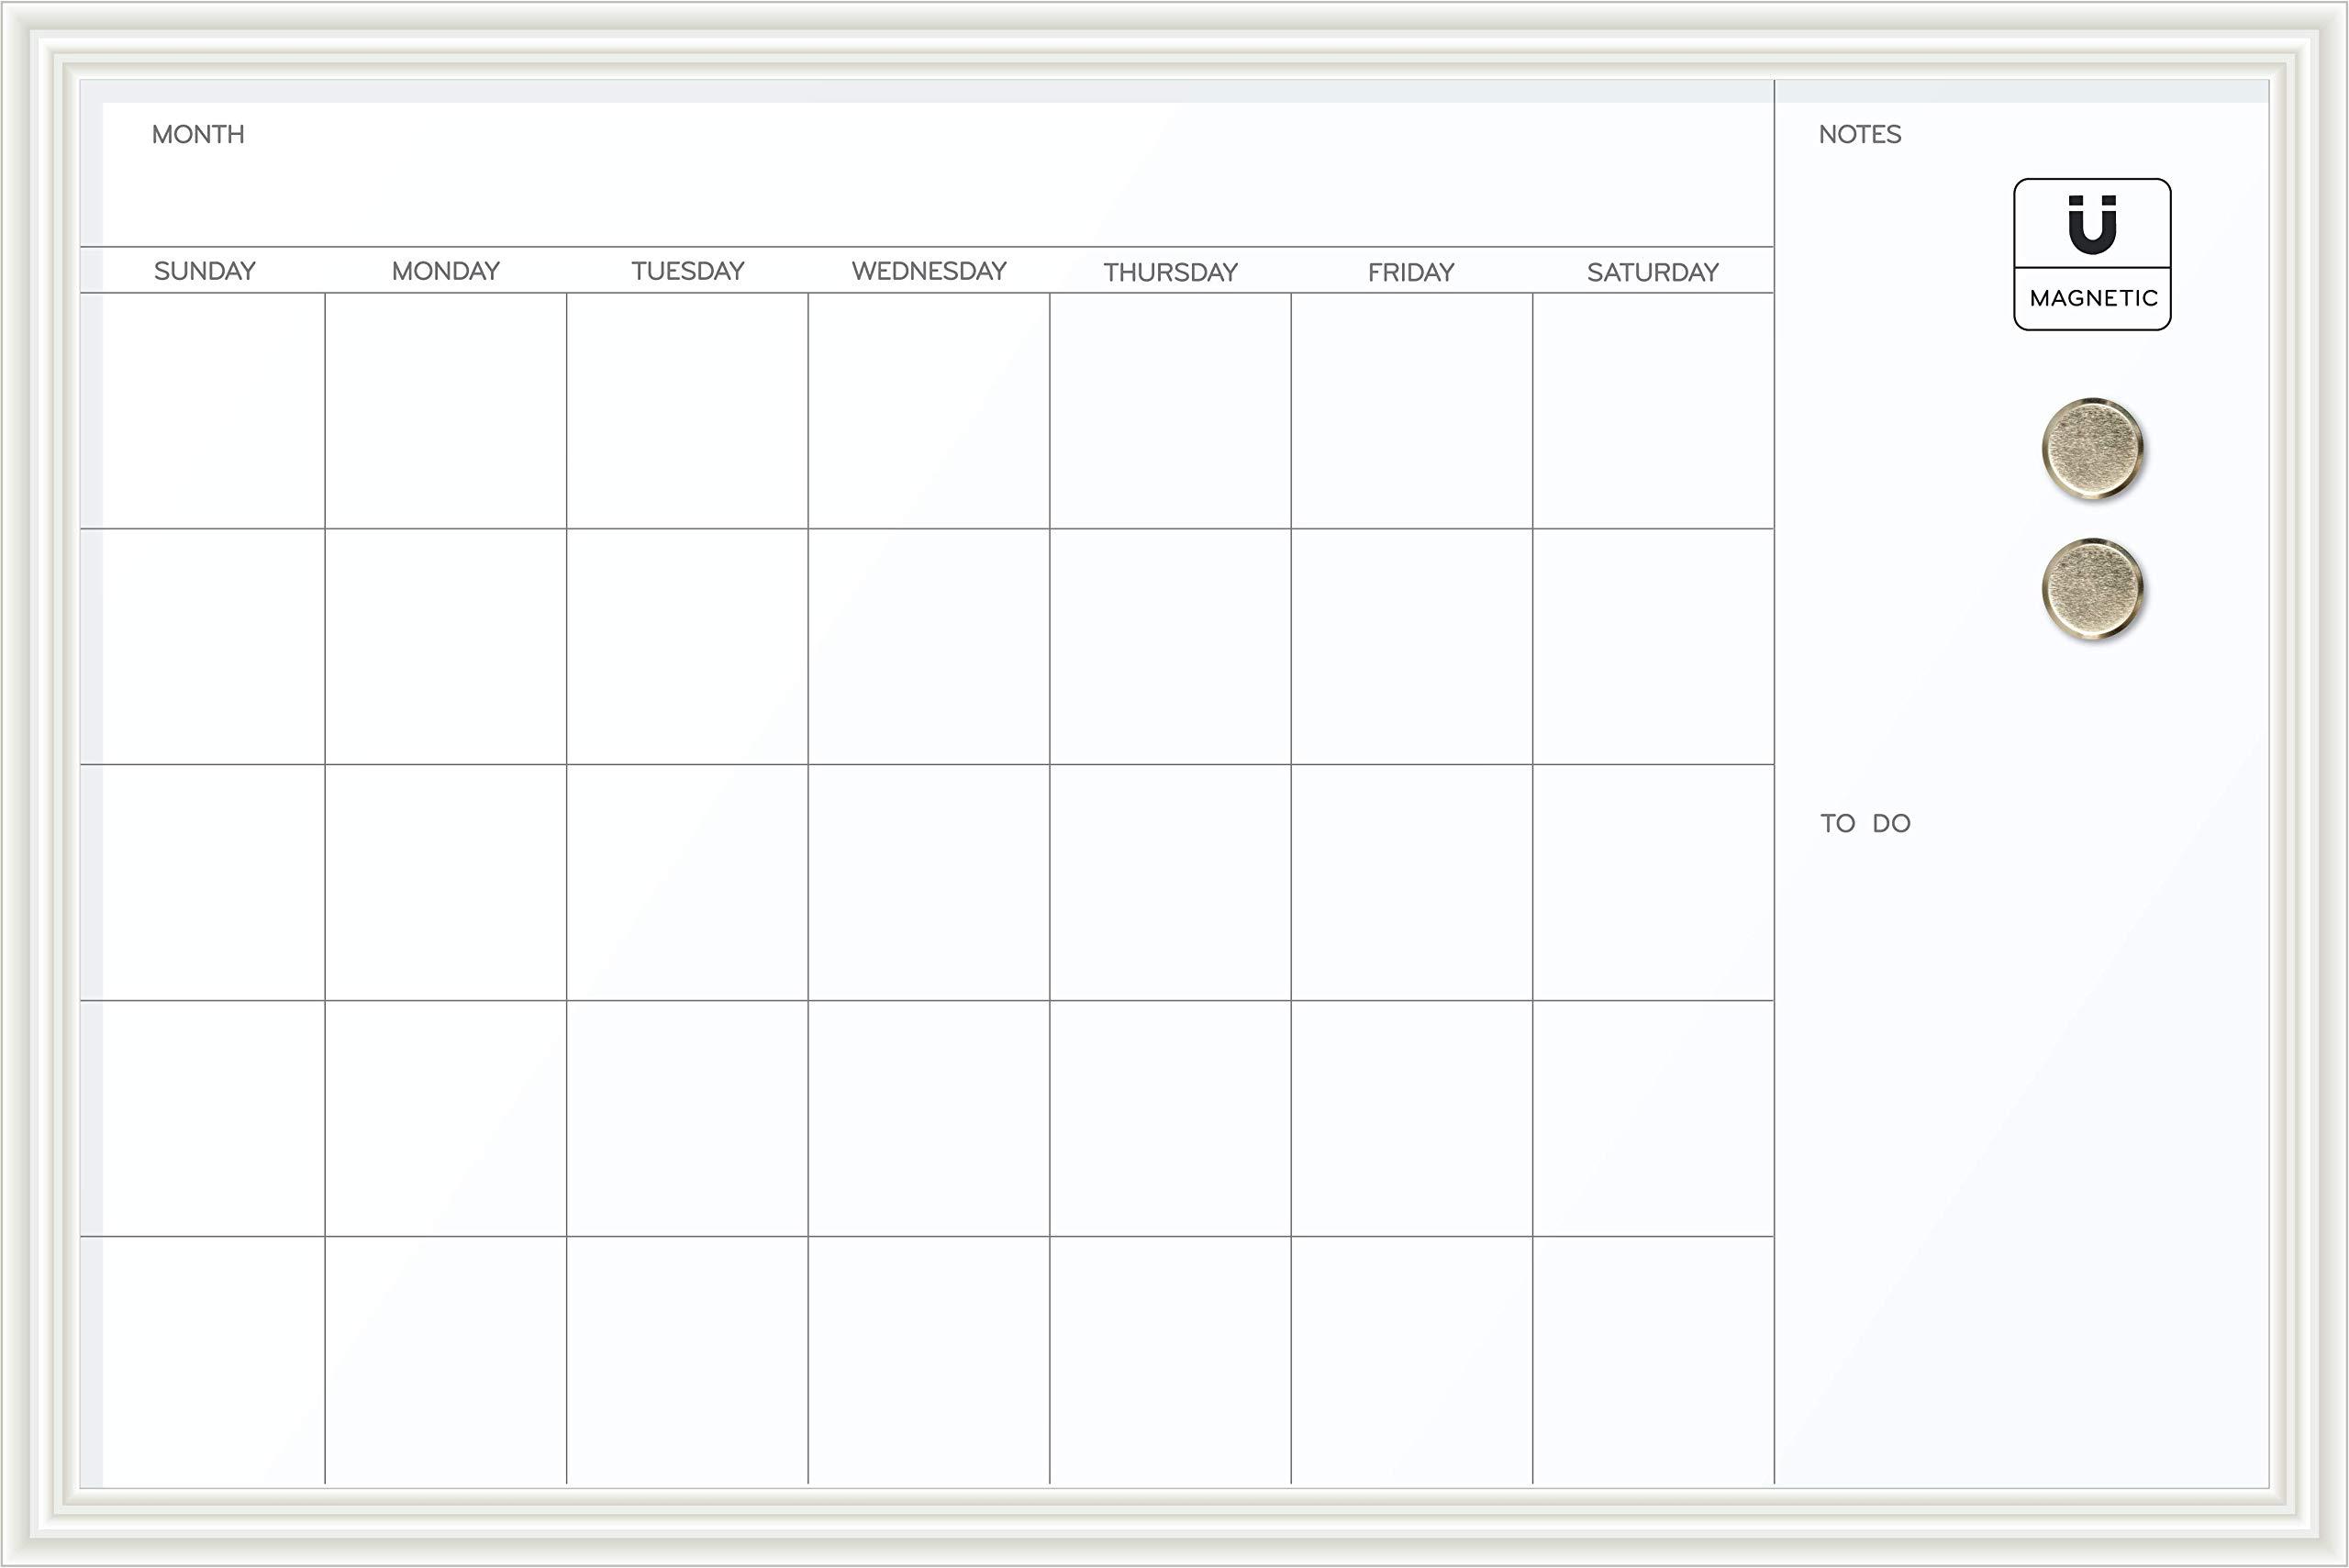 U Brands Magnetic Dry Erase Calendar Board, 20 x 30 Inches, White Wood Frame